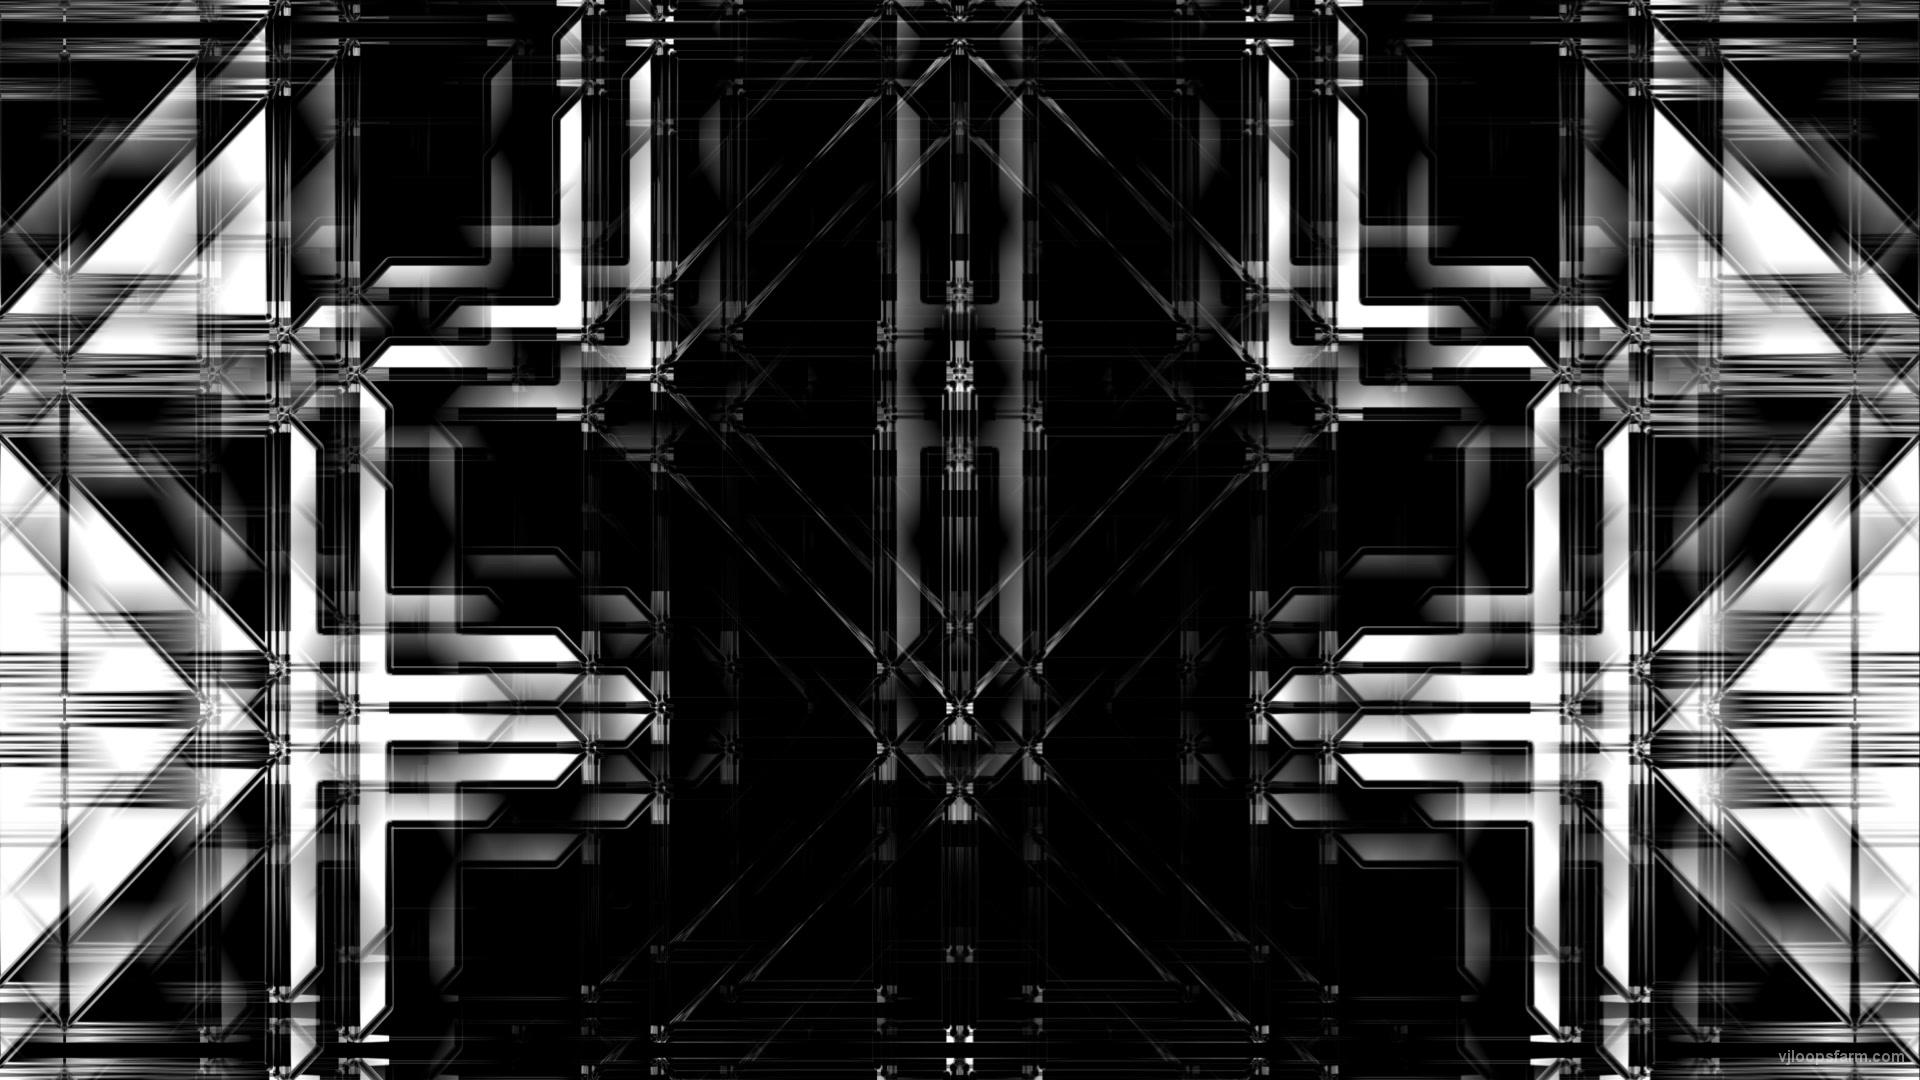 vj video background Minimal-White-Background-V4_1920x1080_29fps_VJLoop_LIMEART_003